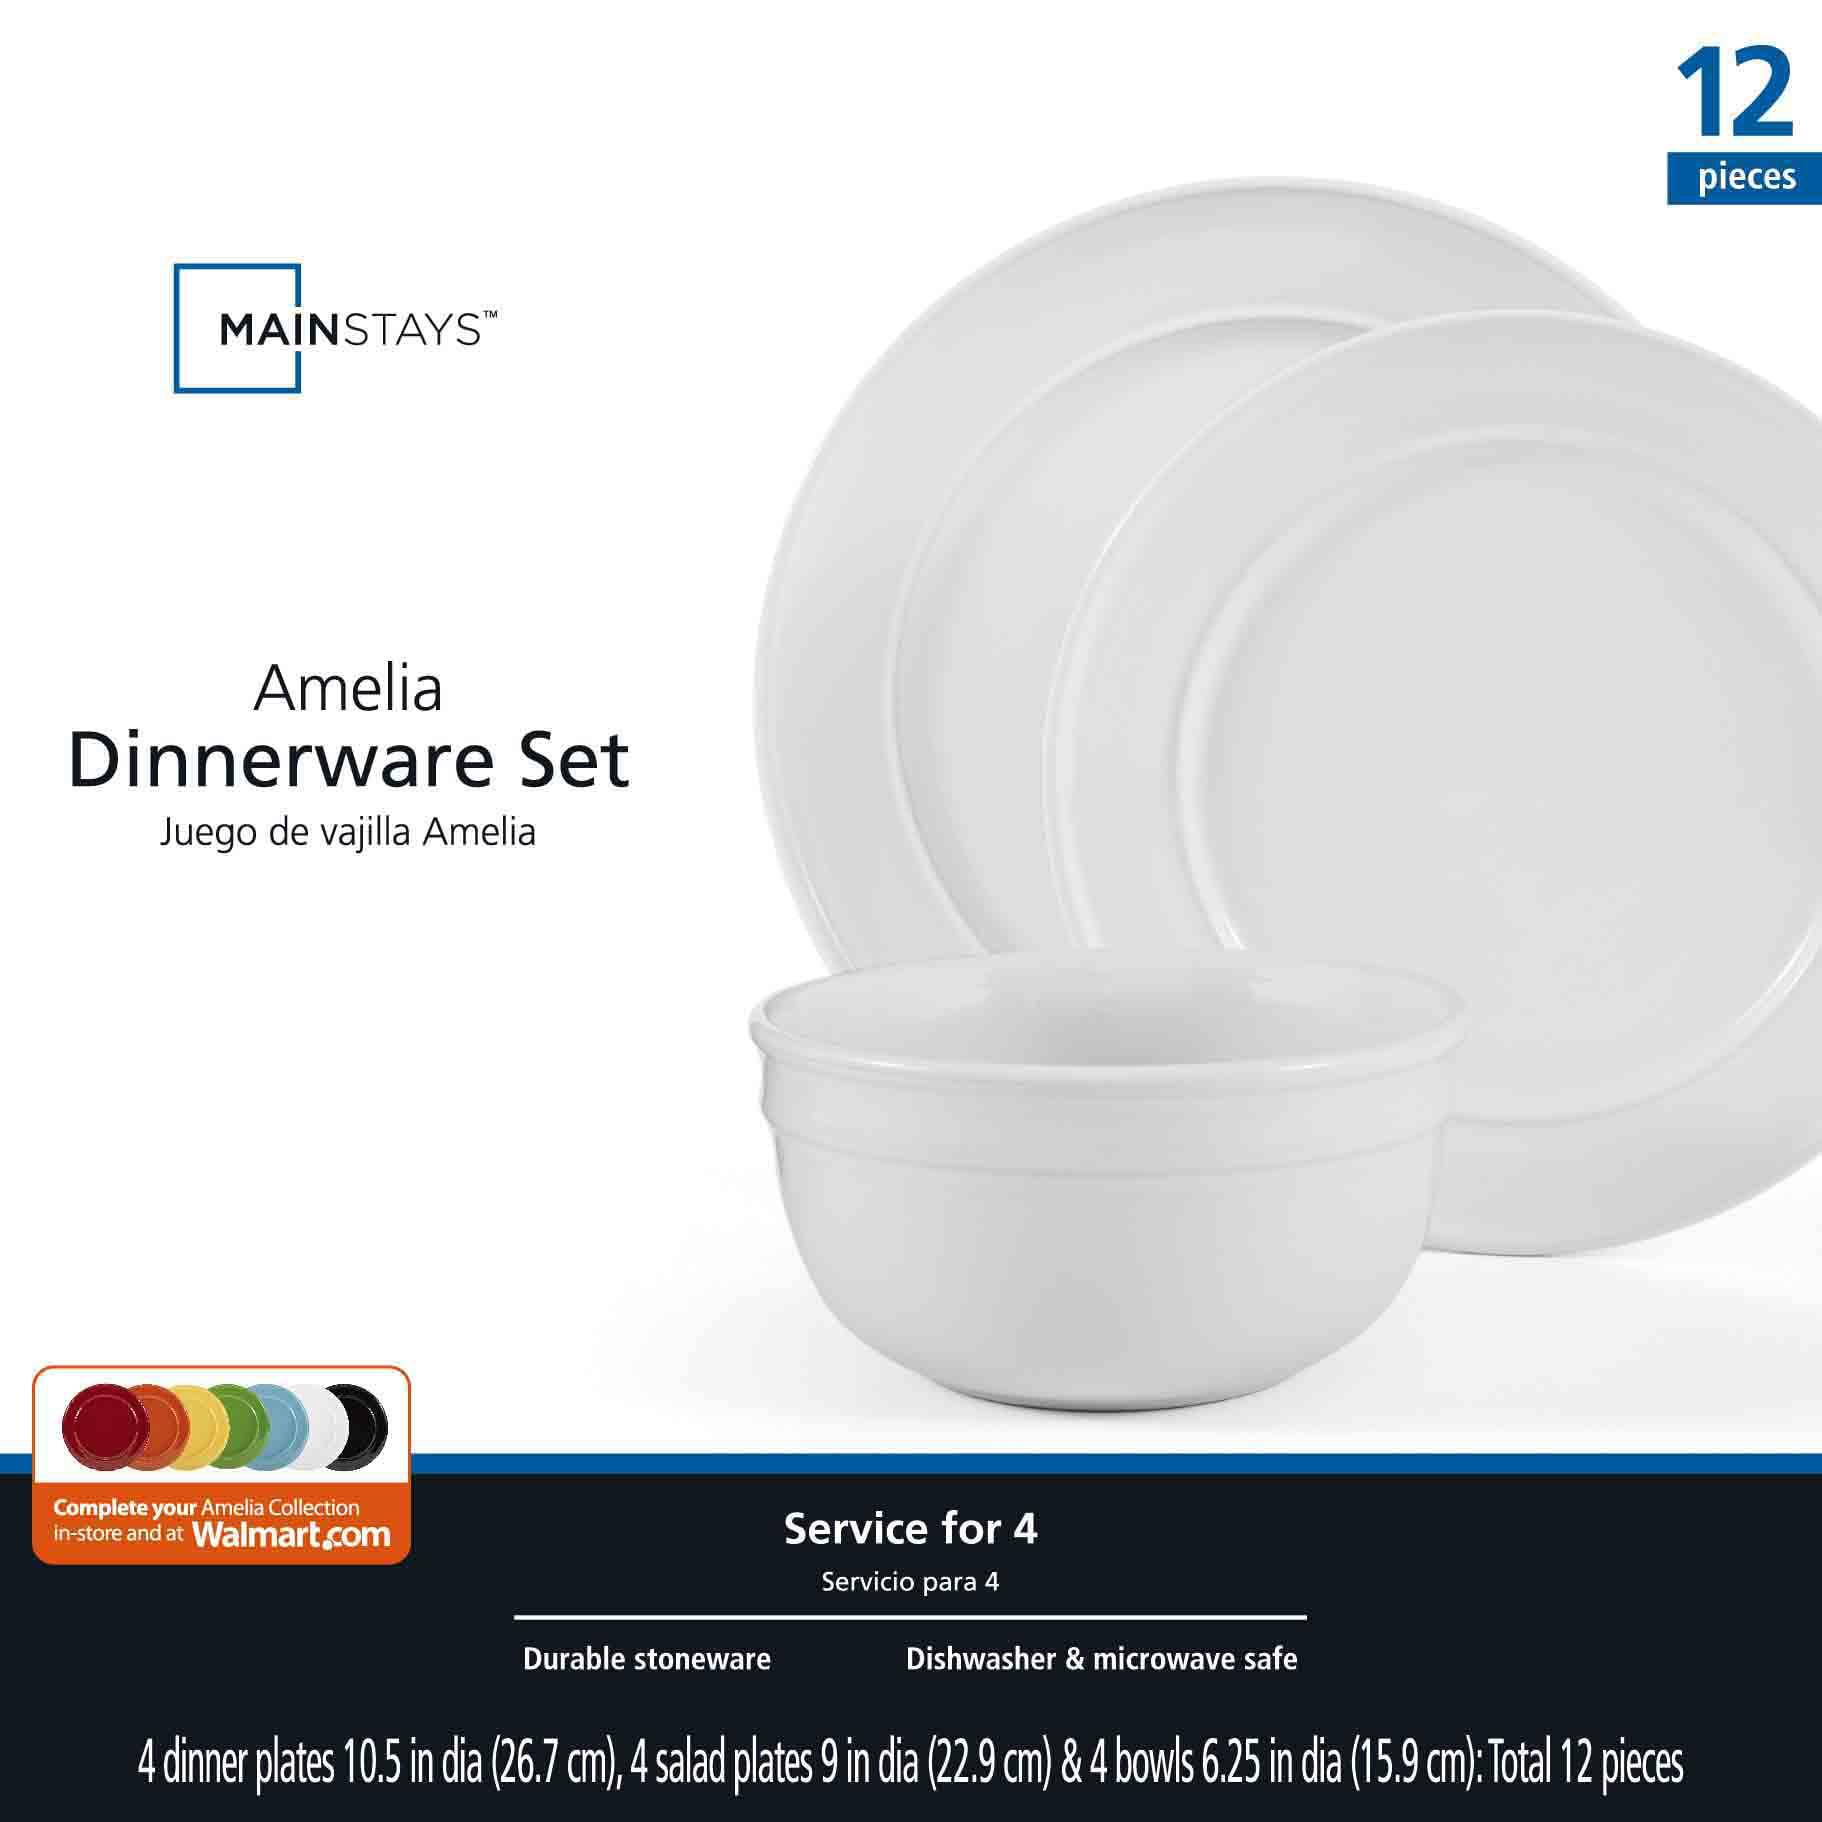 sc 1 th 225 & Mainstays Amelia 12-Piece Solid Color Dinnerware Set - Walmart.com